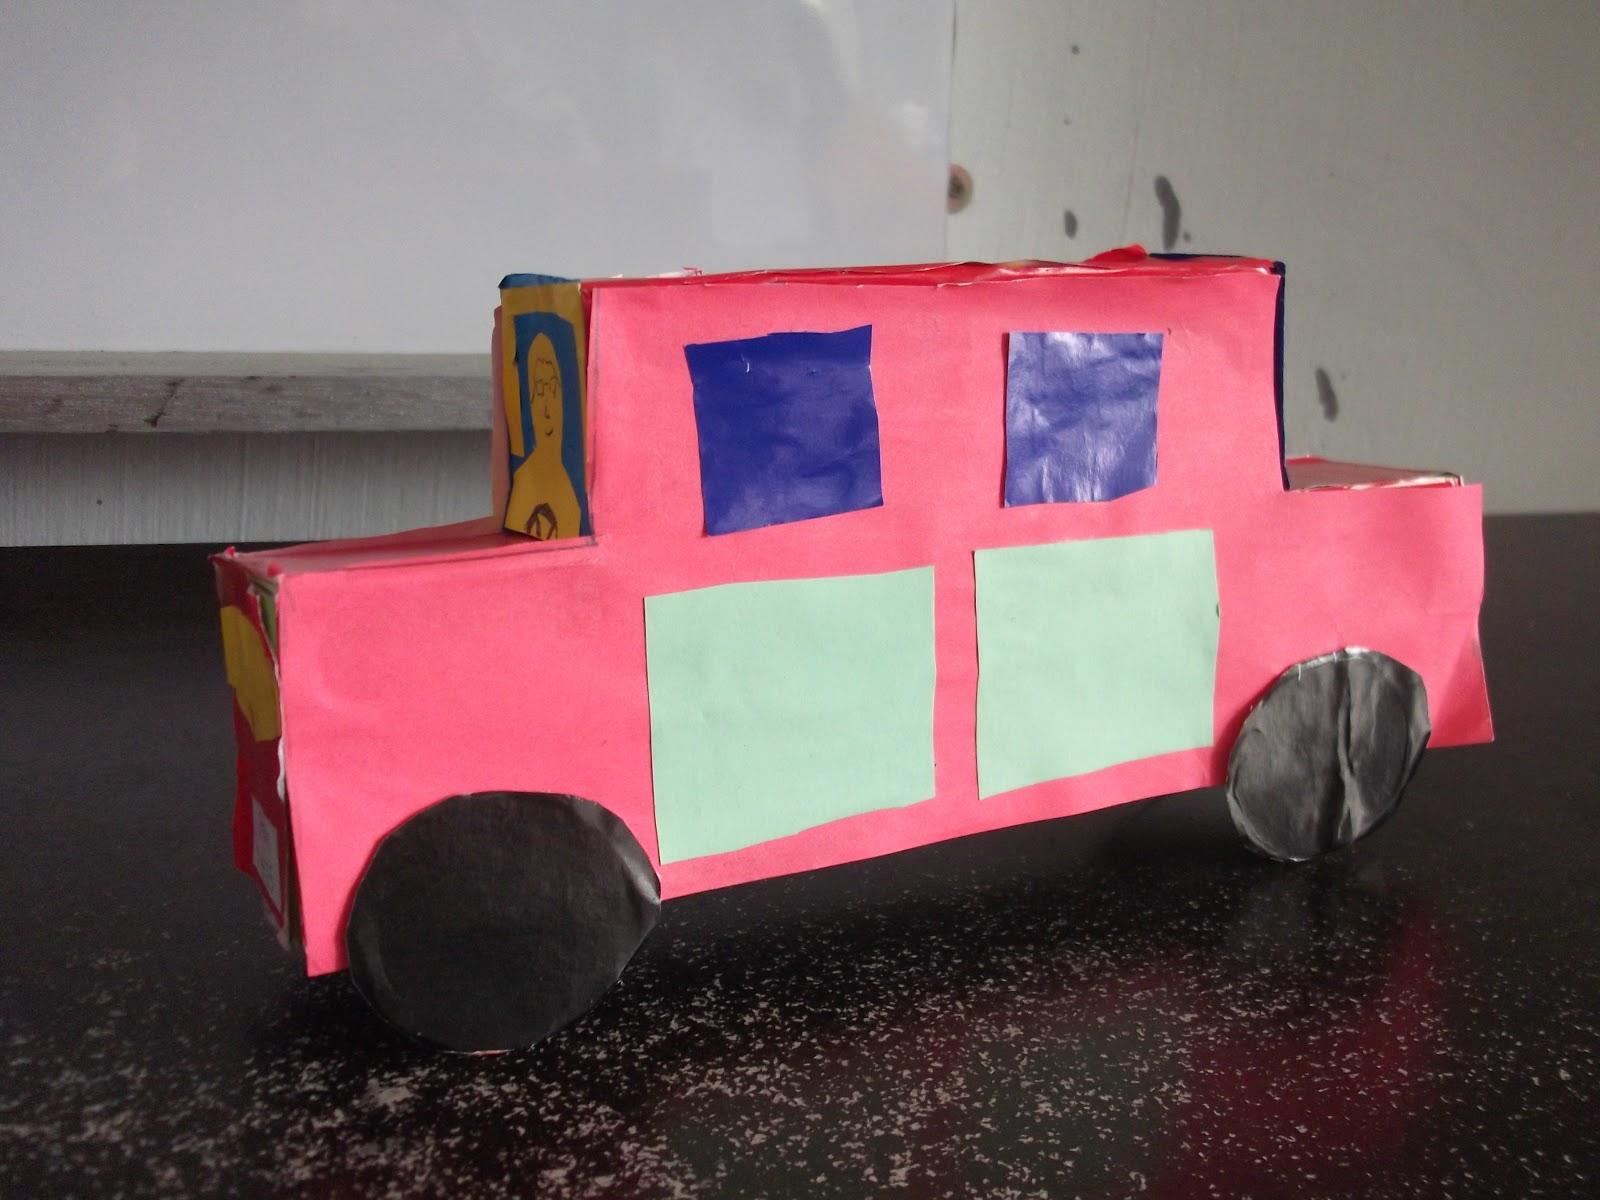 Membentuk dan Membuat Binaan ( kenderaan)